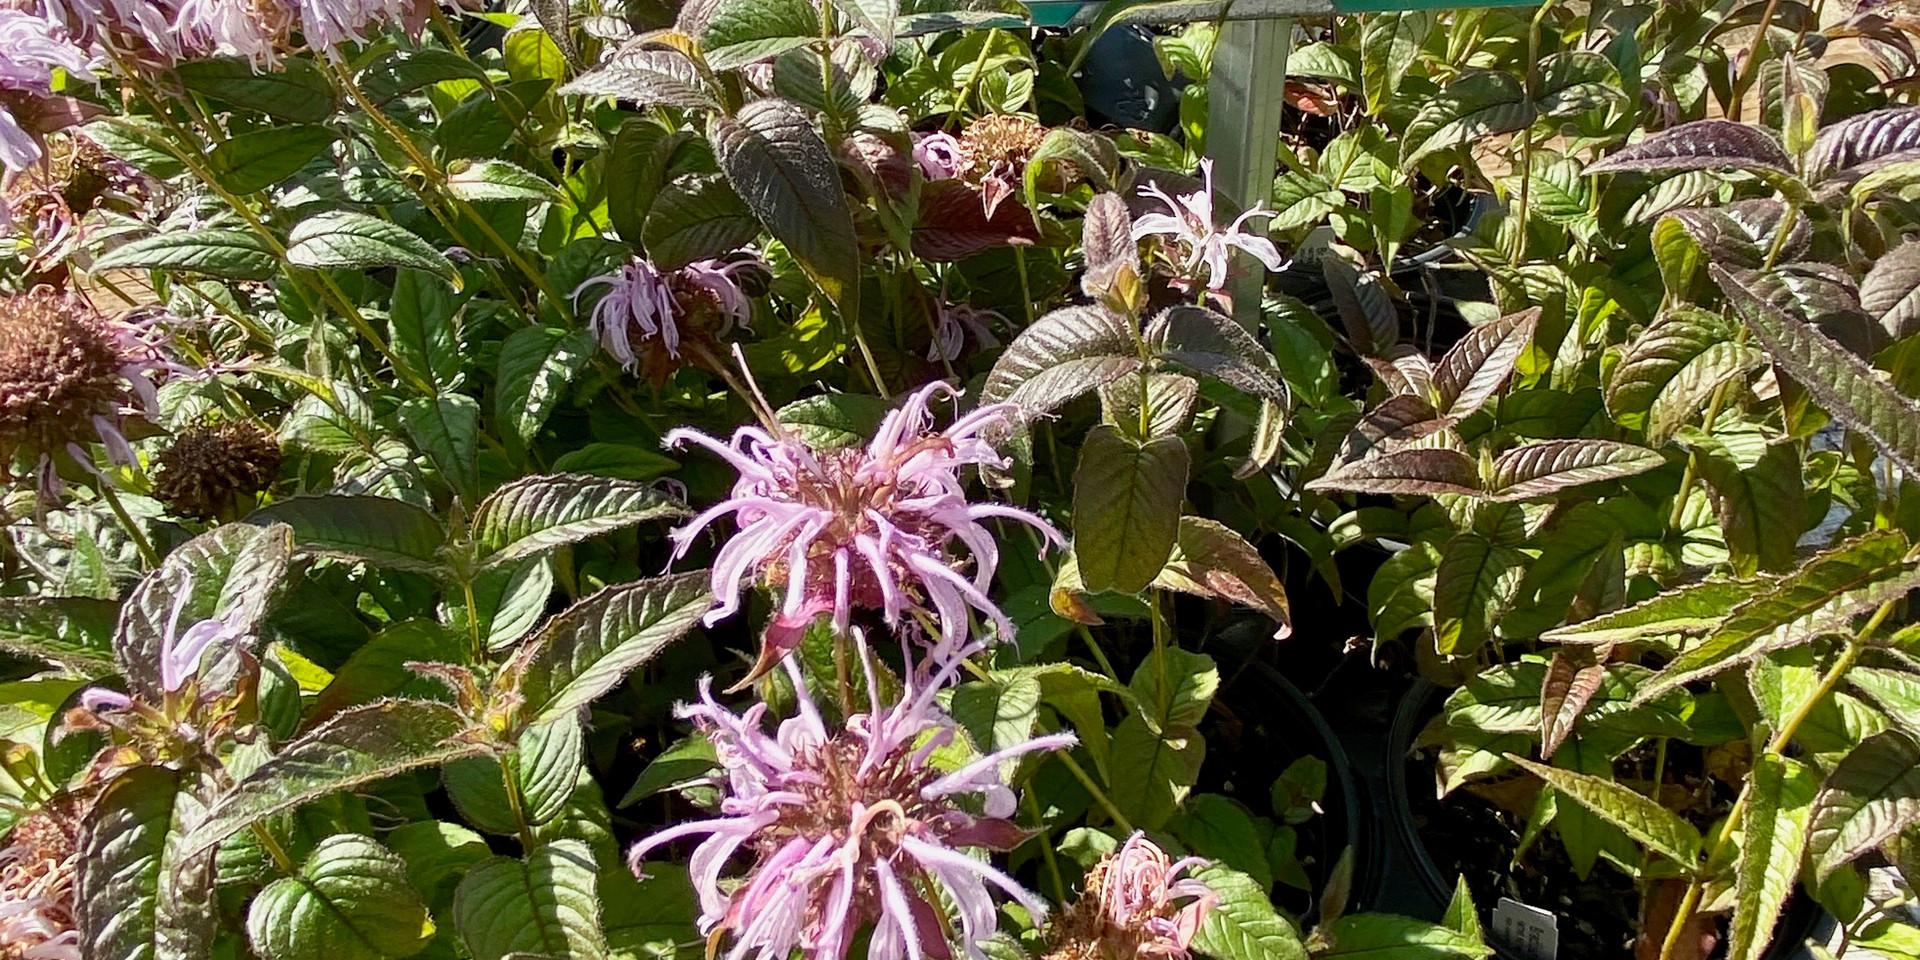 We have 5+ varieties of beautiful Bee Balm for your pollinators!